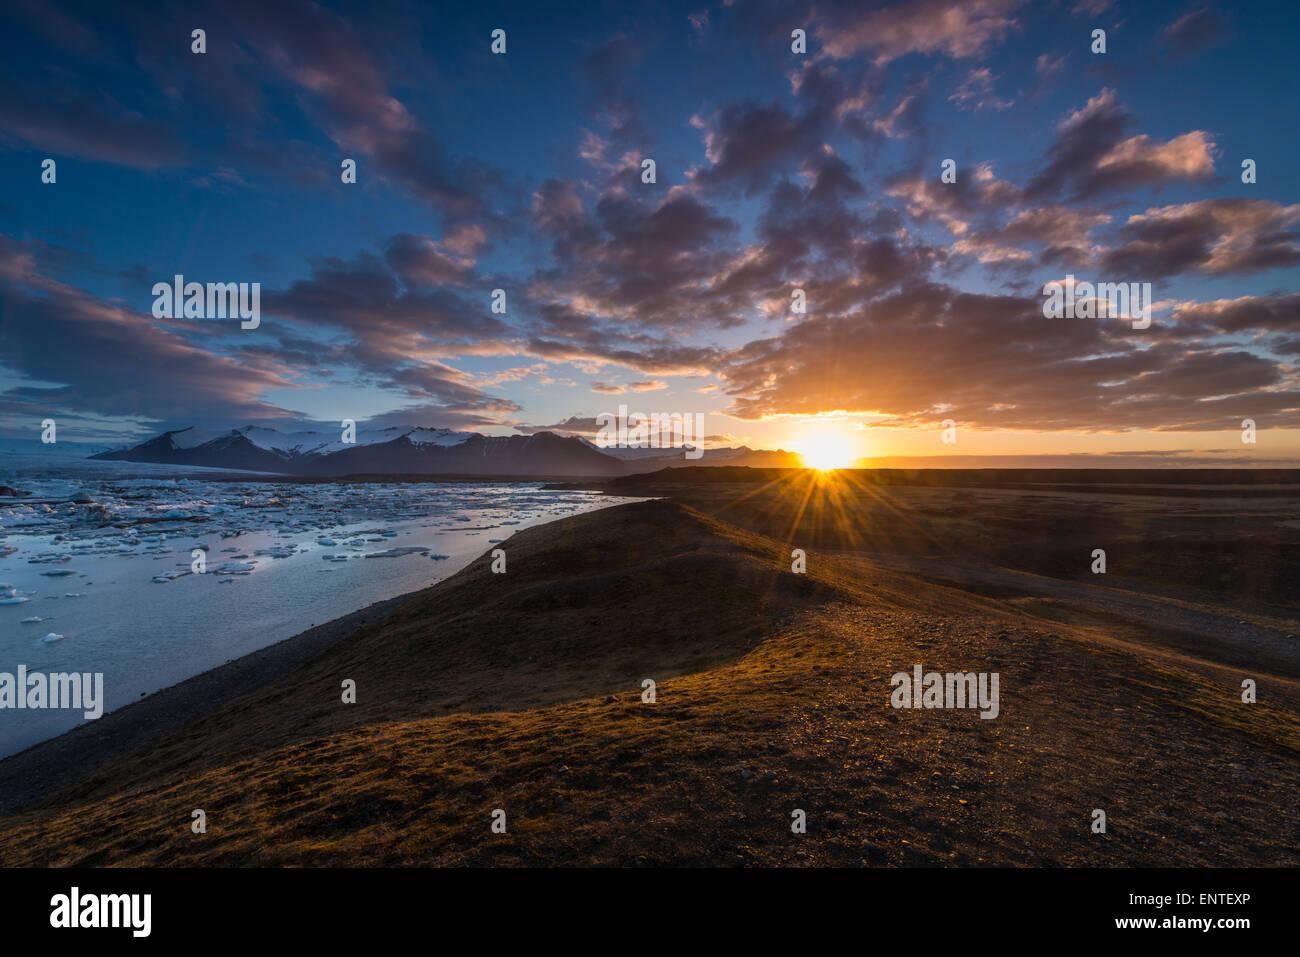 Islandia horizontal - Amanecer al amanecer en Jokulsarlon Lagoon, Parque Nacional Vatnajokull, Islandia Imagen De Stock